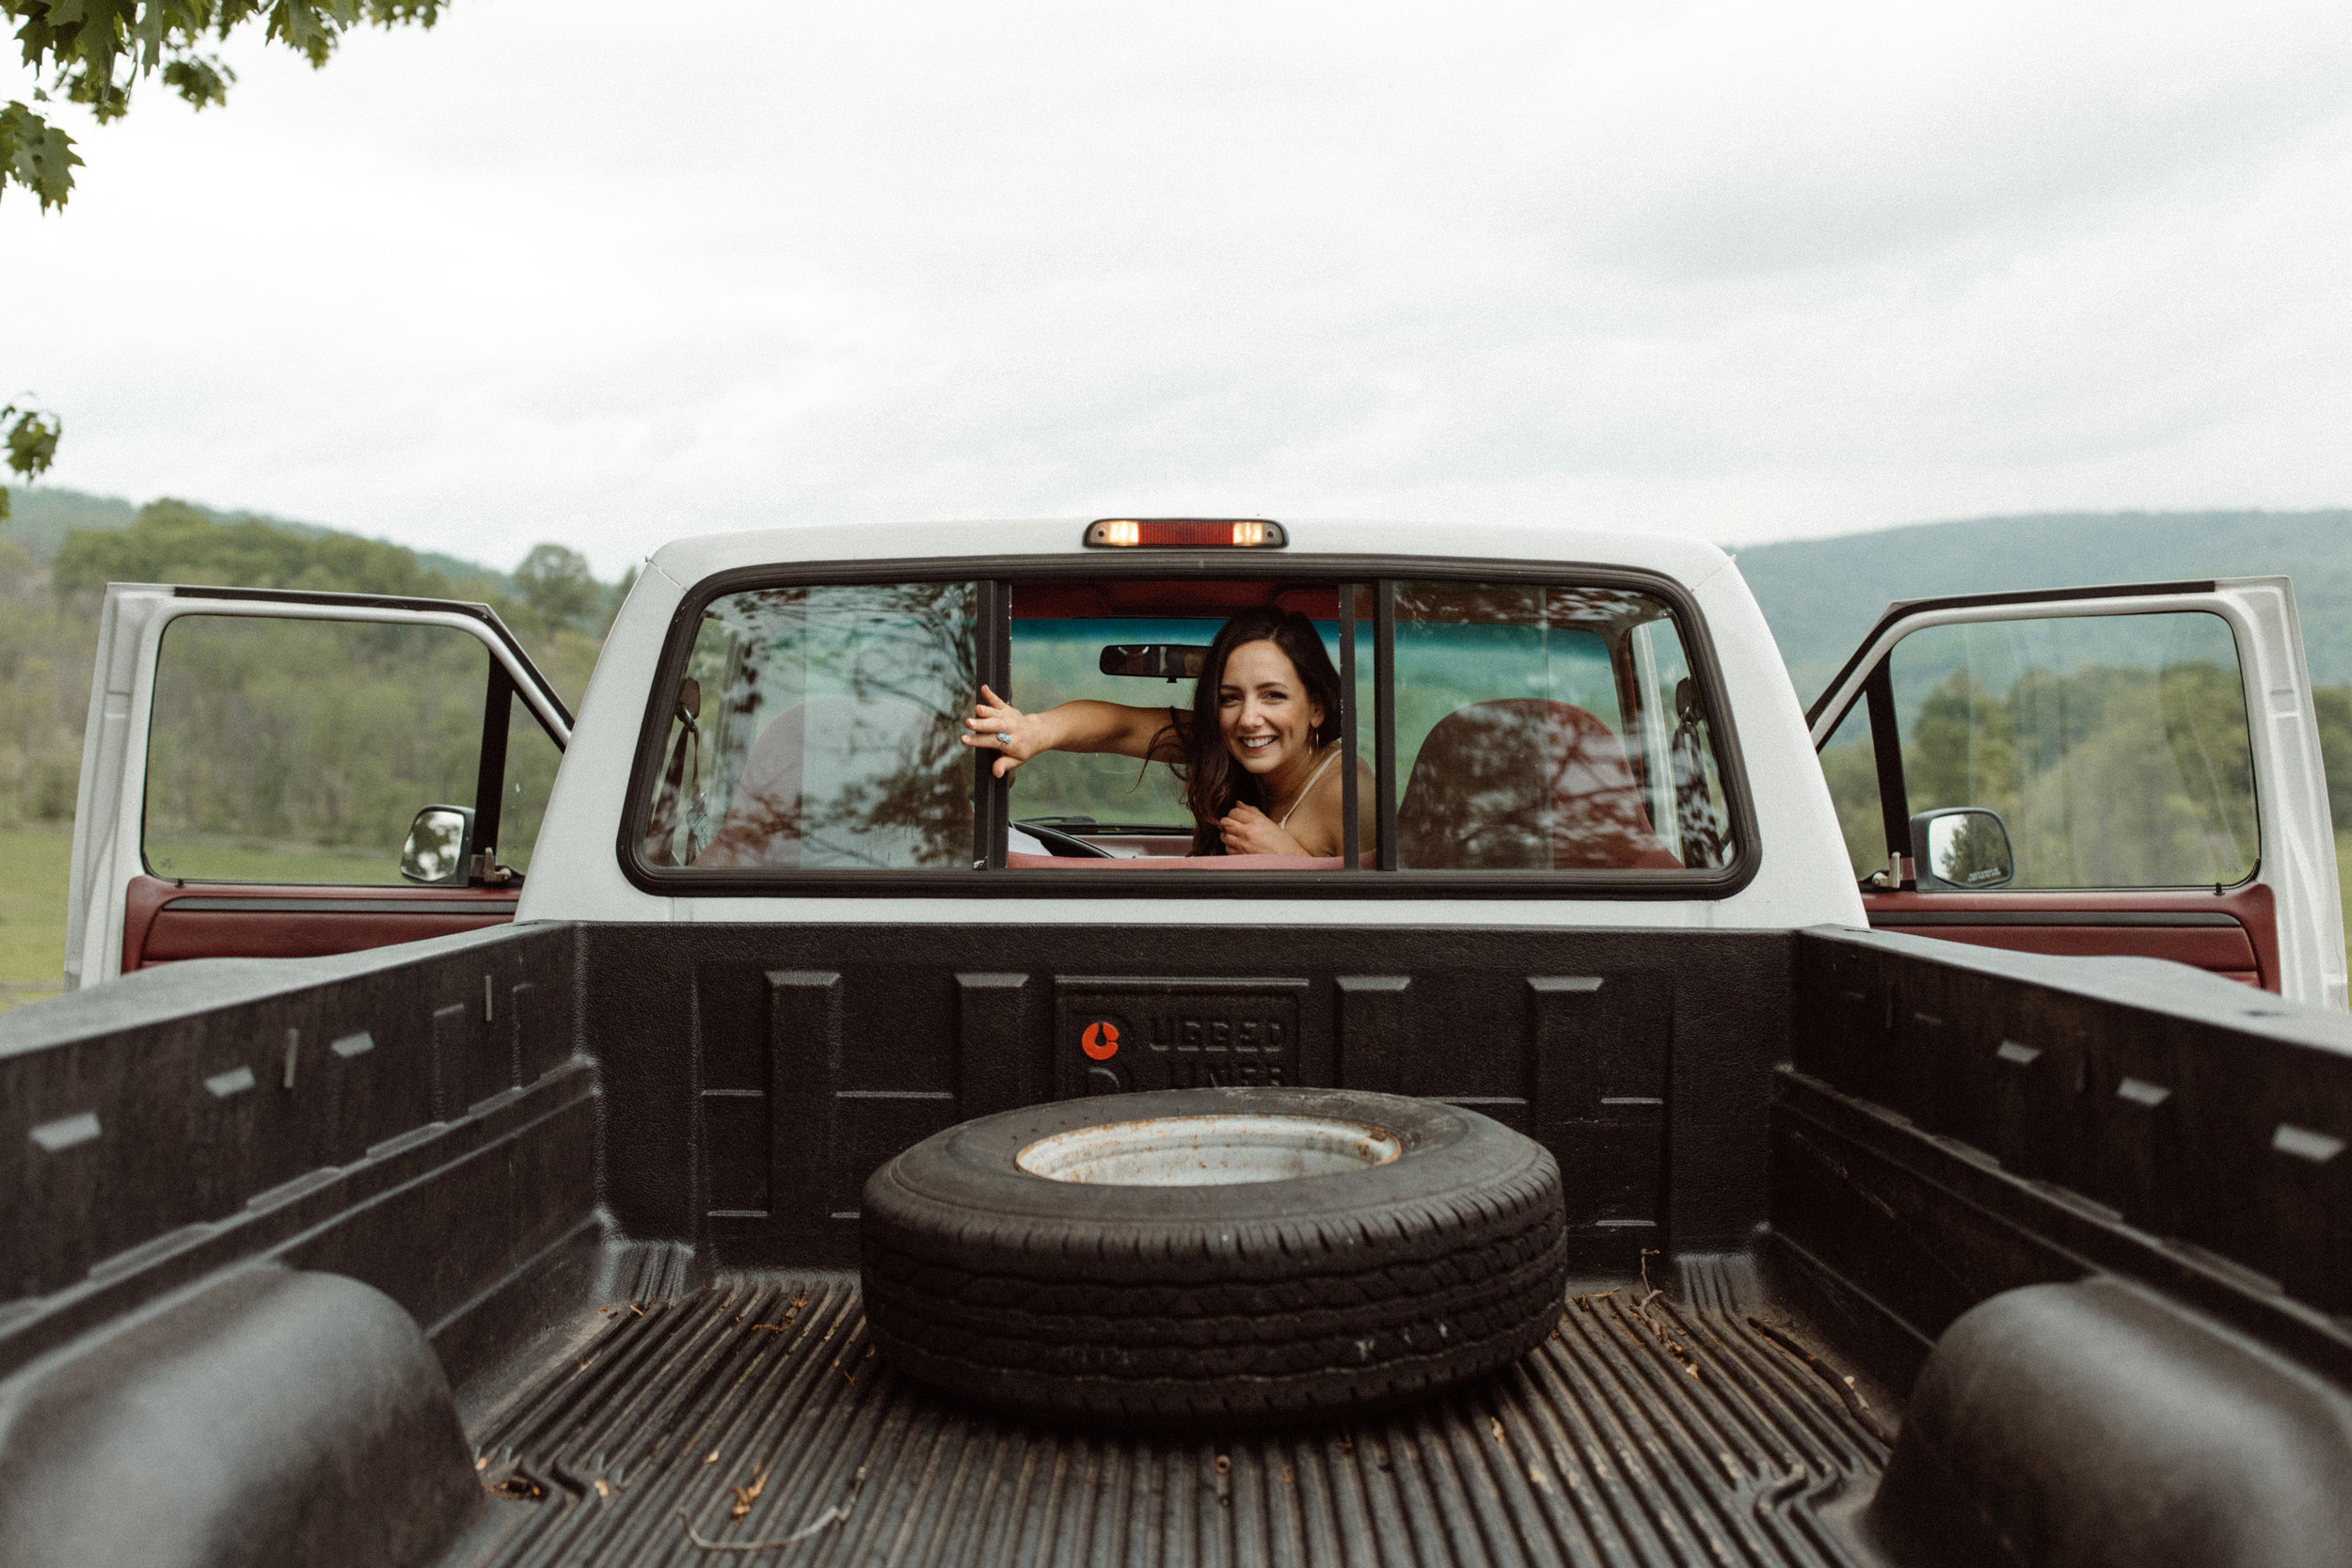 kelsey&mark-engagement-skymeadows-2019-peytoncurry-8512.jpg